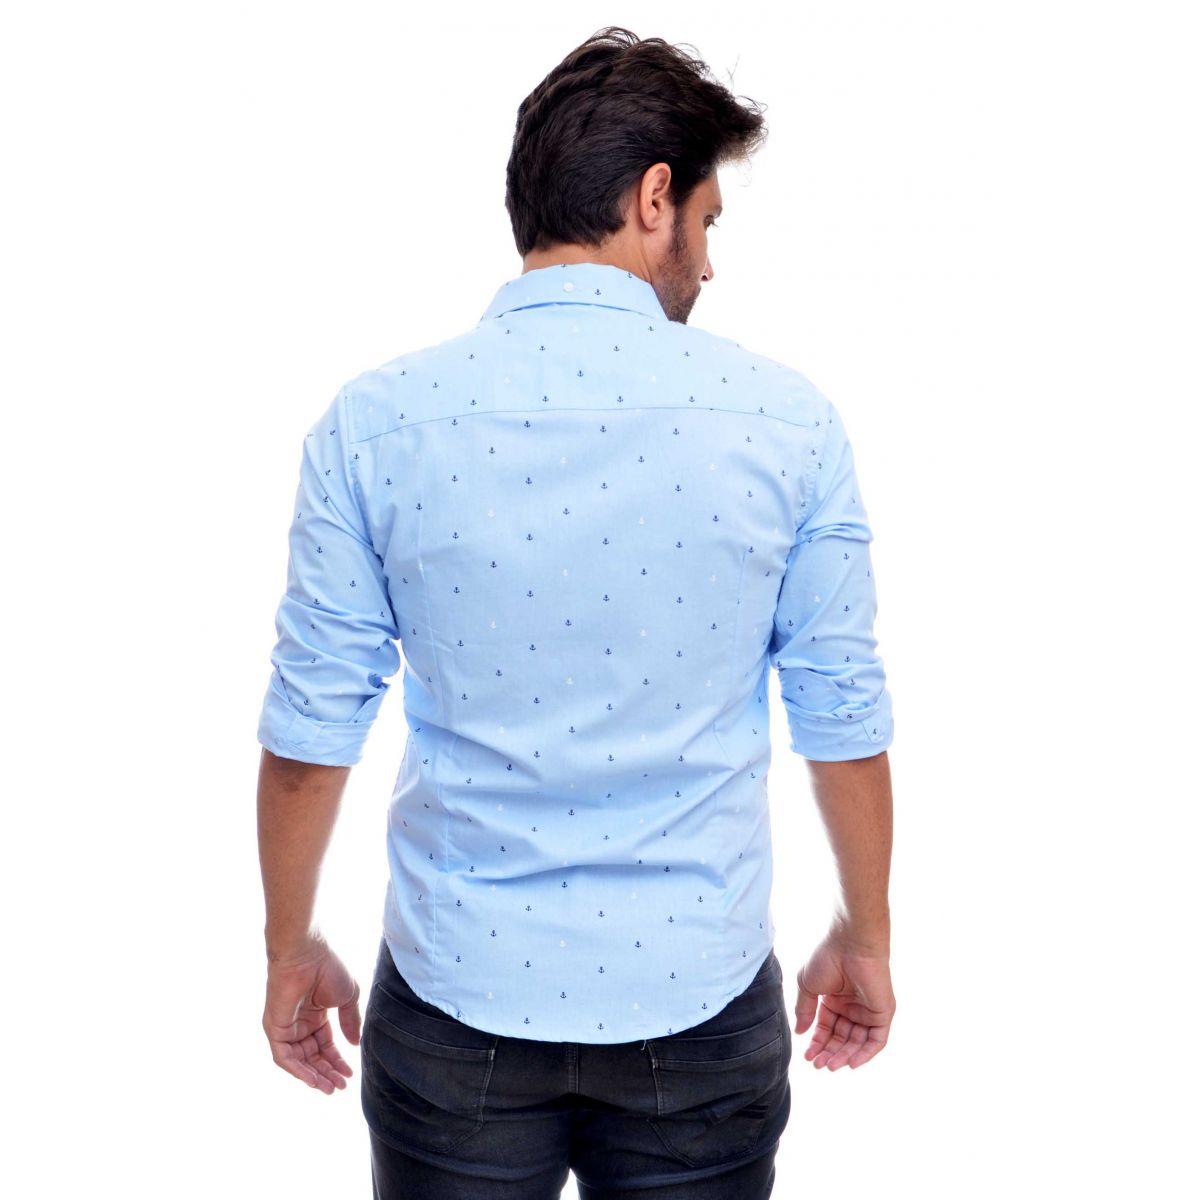 Camisa Social SK Azul Claro Mini Print Ancoras   - Ca Brasileira